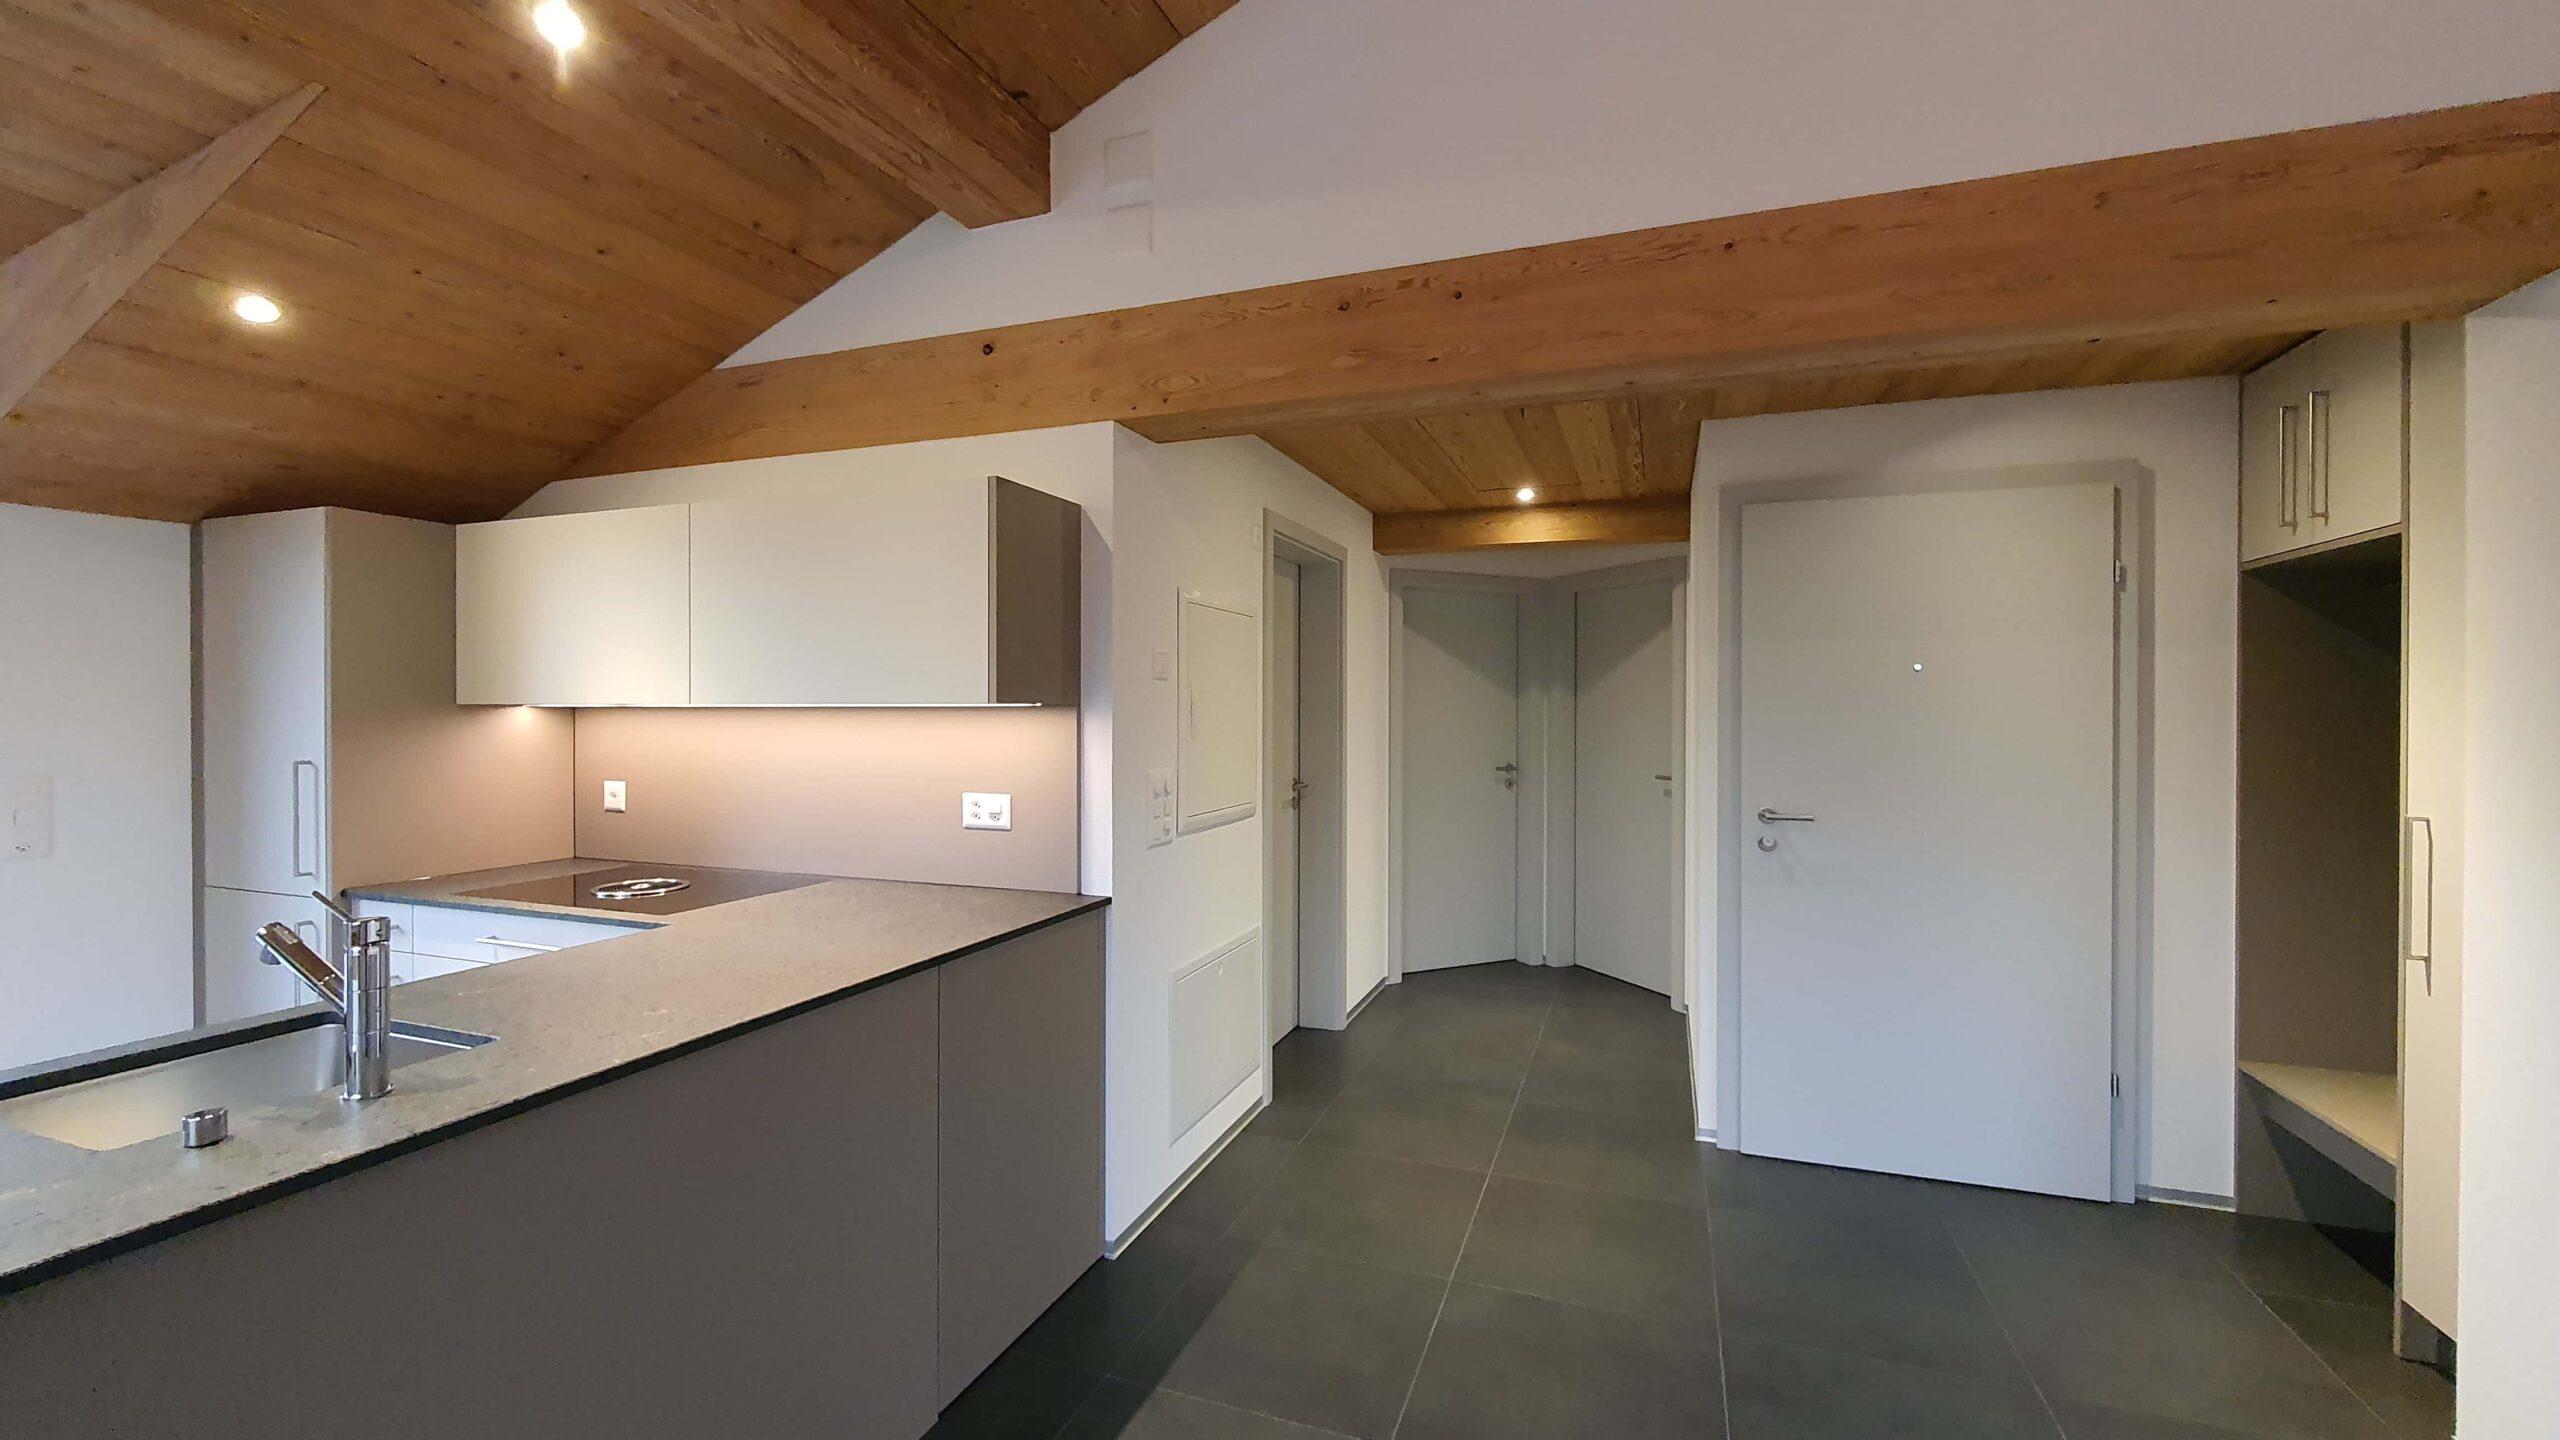 Wooddesign_Holzdesign_Altholz_rustikal_modern Holzdecke_Balkenverkleidung_Wandverkleidung_Wohnungumbau_Ausbau Wohnung (4)-min